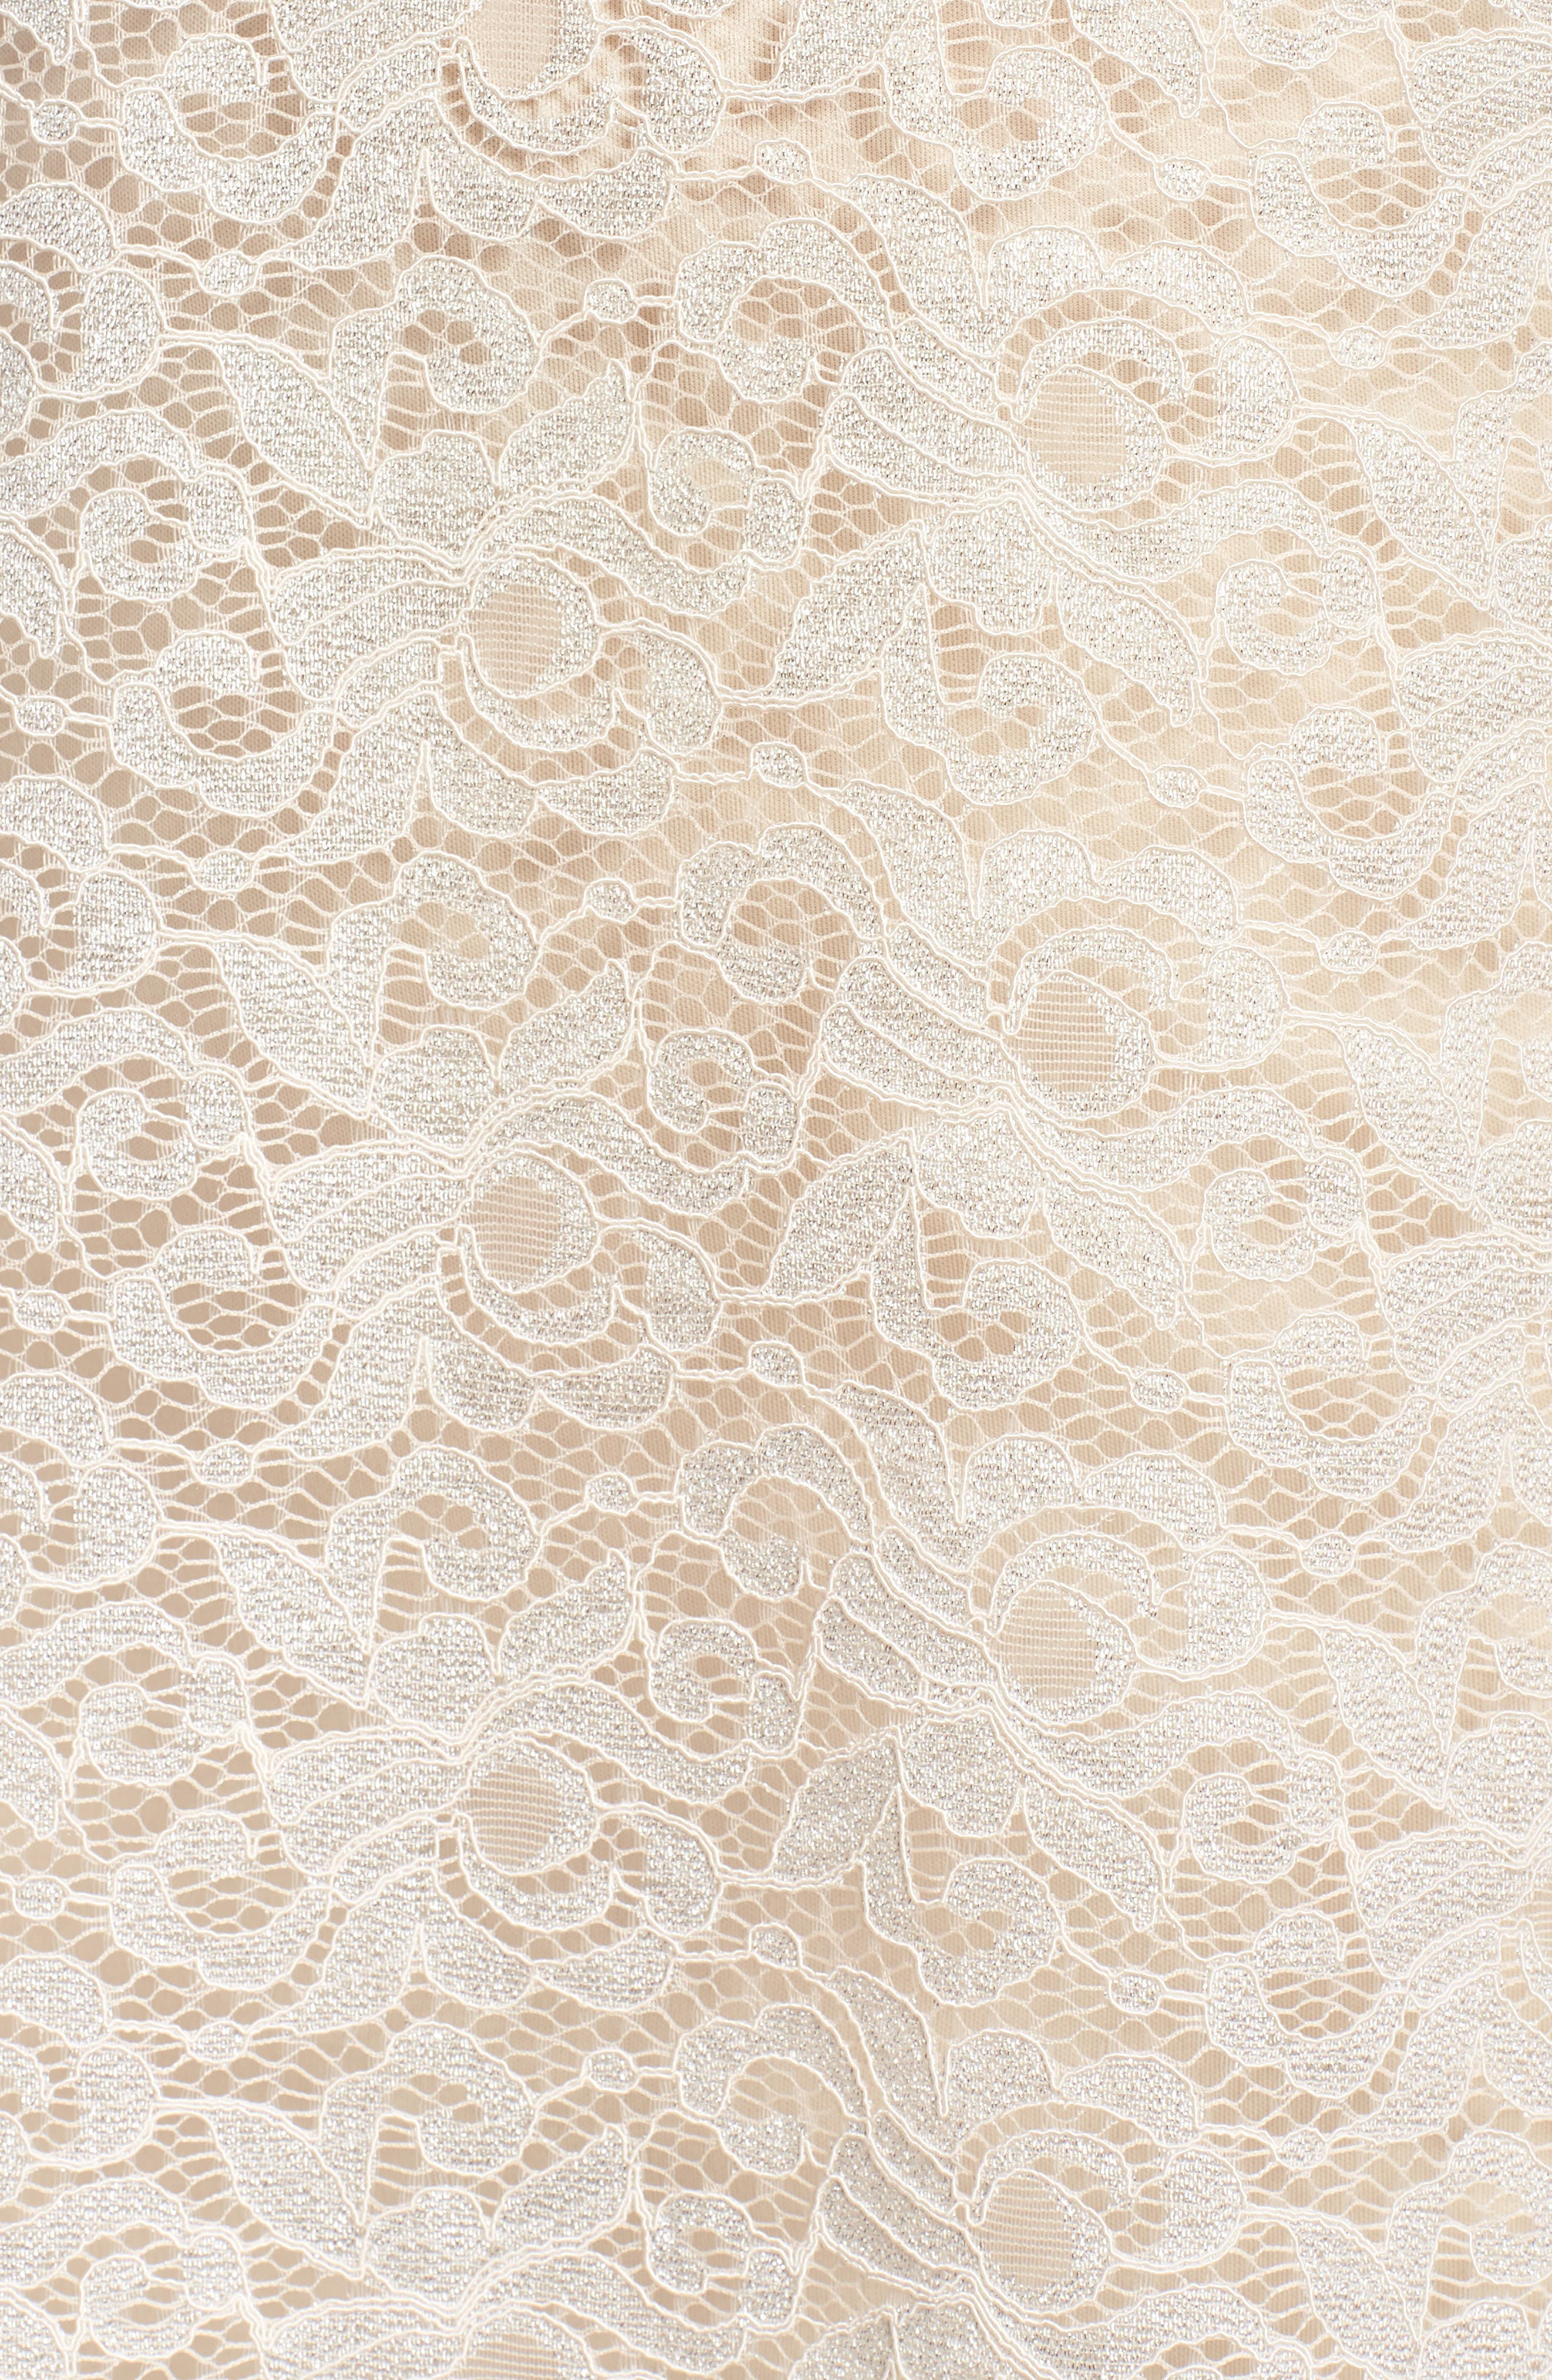 Lace A-Line Dress,                             Alternate thumbnail 5, color,                             Taupe